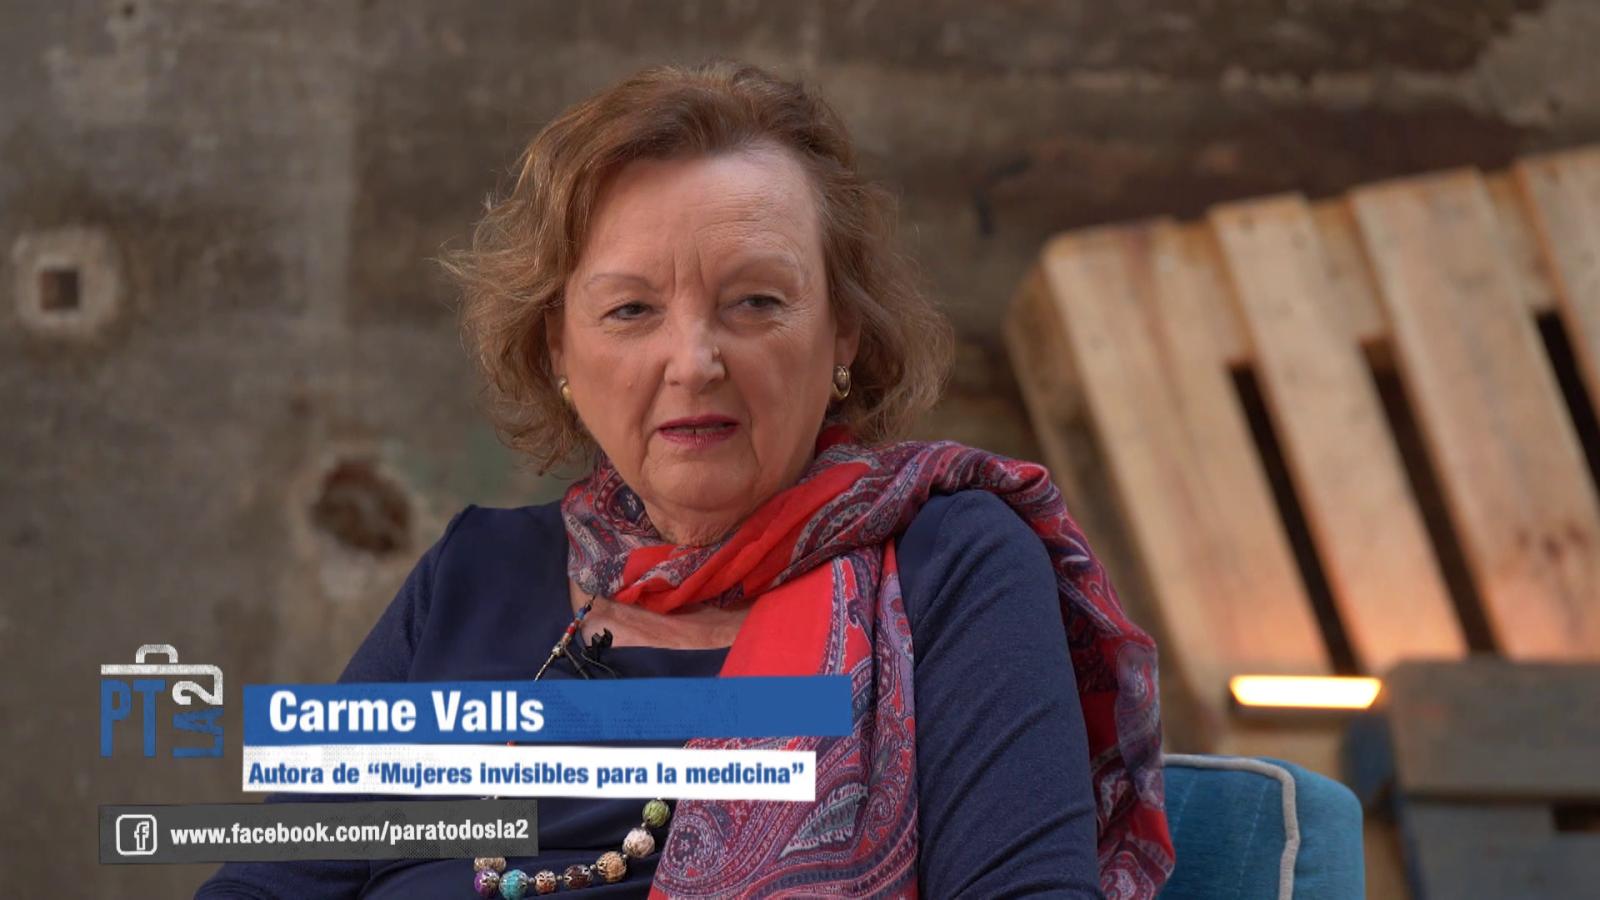 Mujeres invisibles para la medicina.Entrevista a Carme Valls